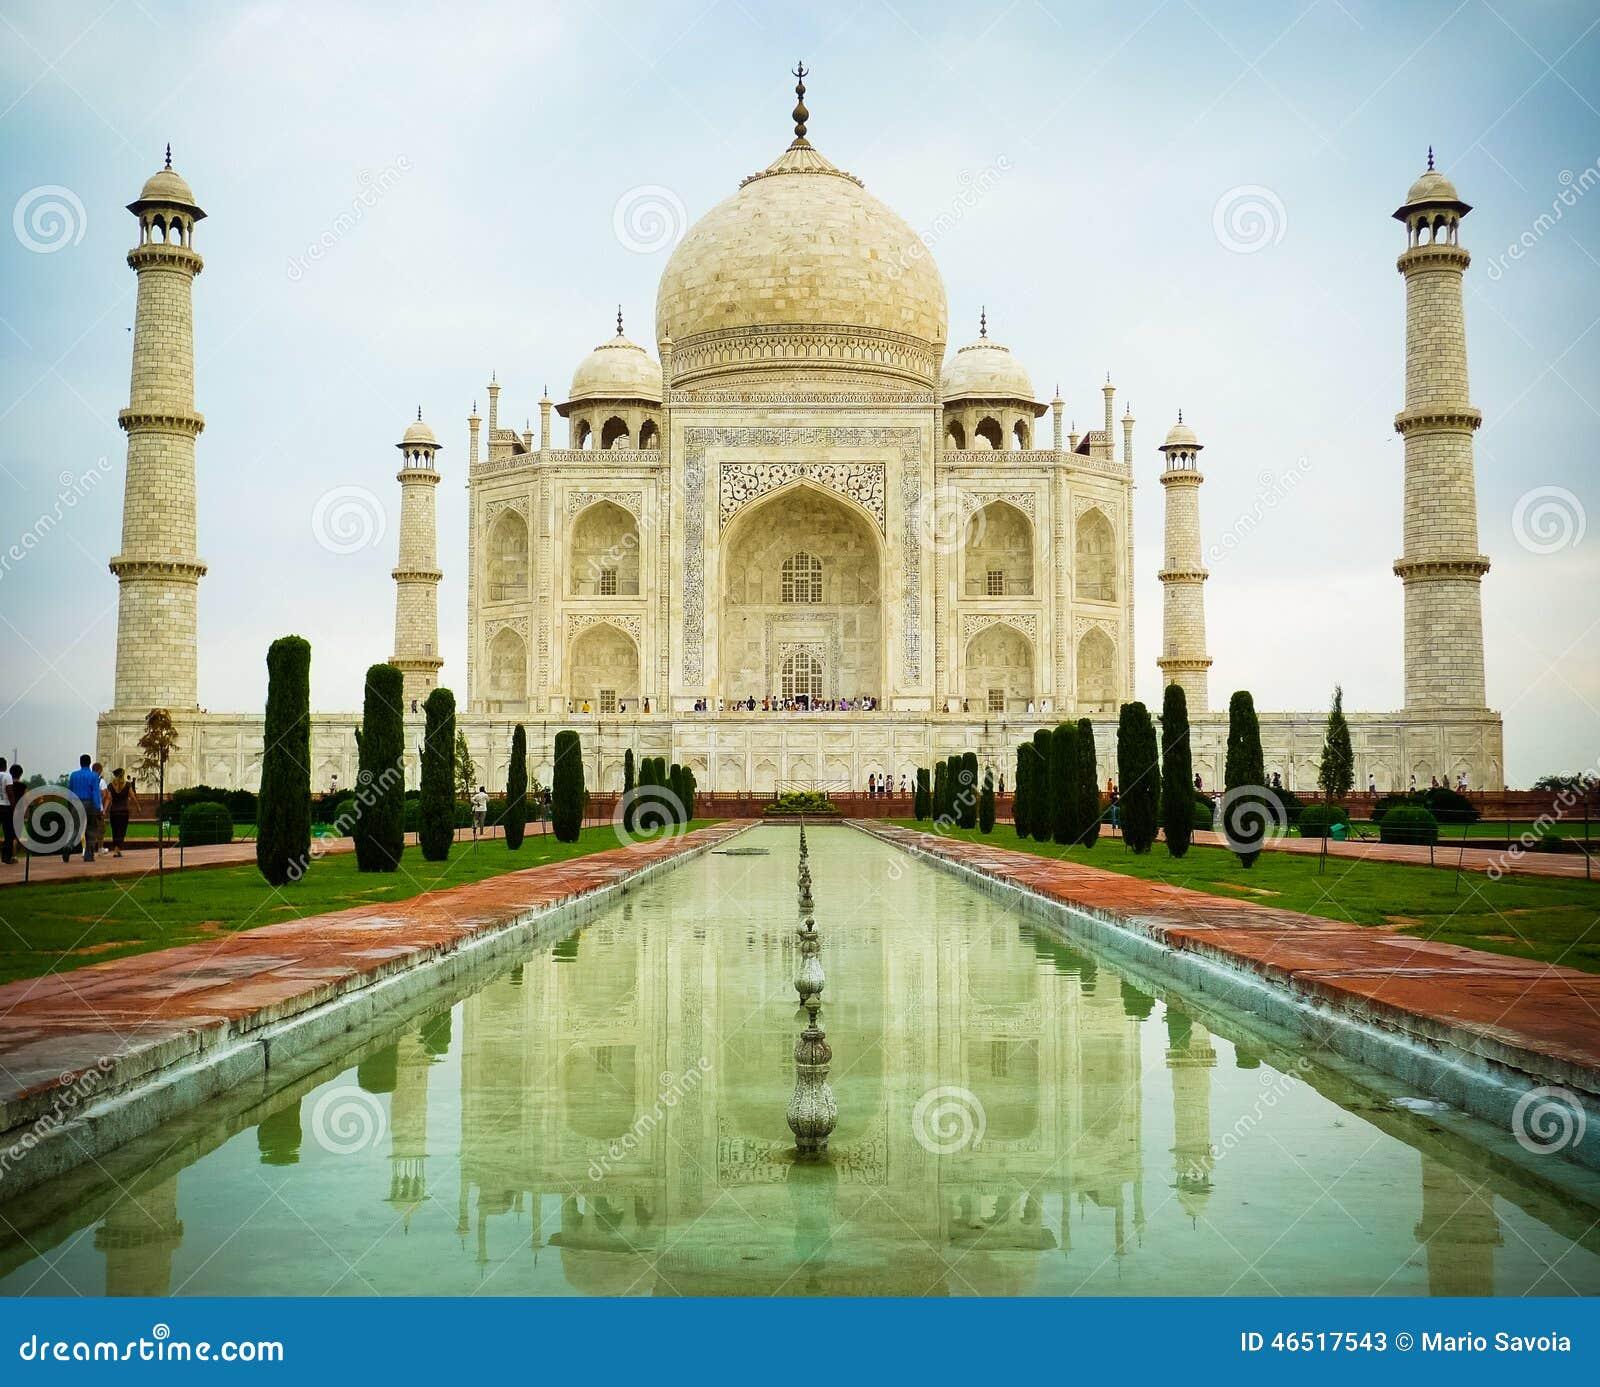 Taj Mahal Low Angle Front View Stock Image - Image of pradesh ...